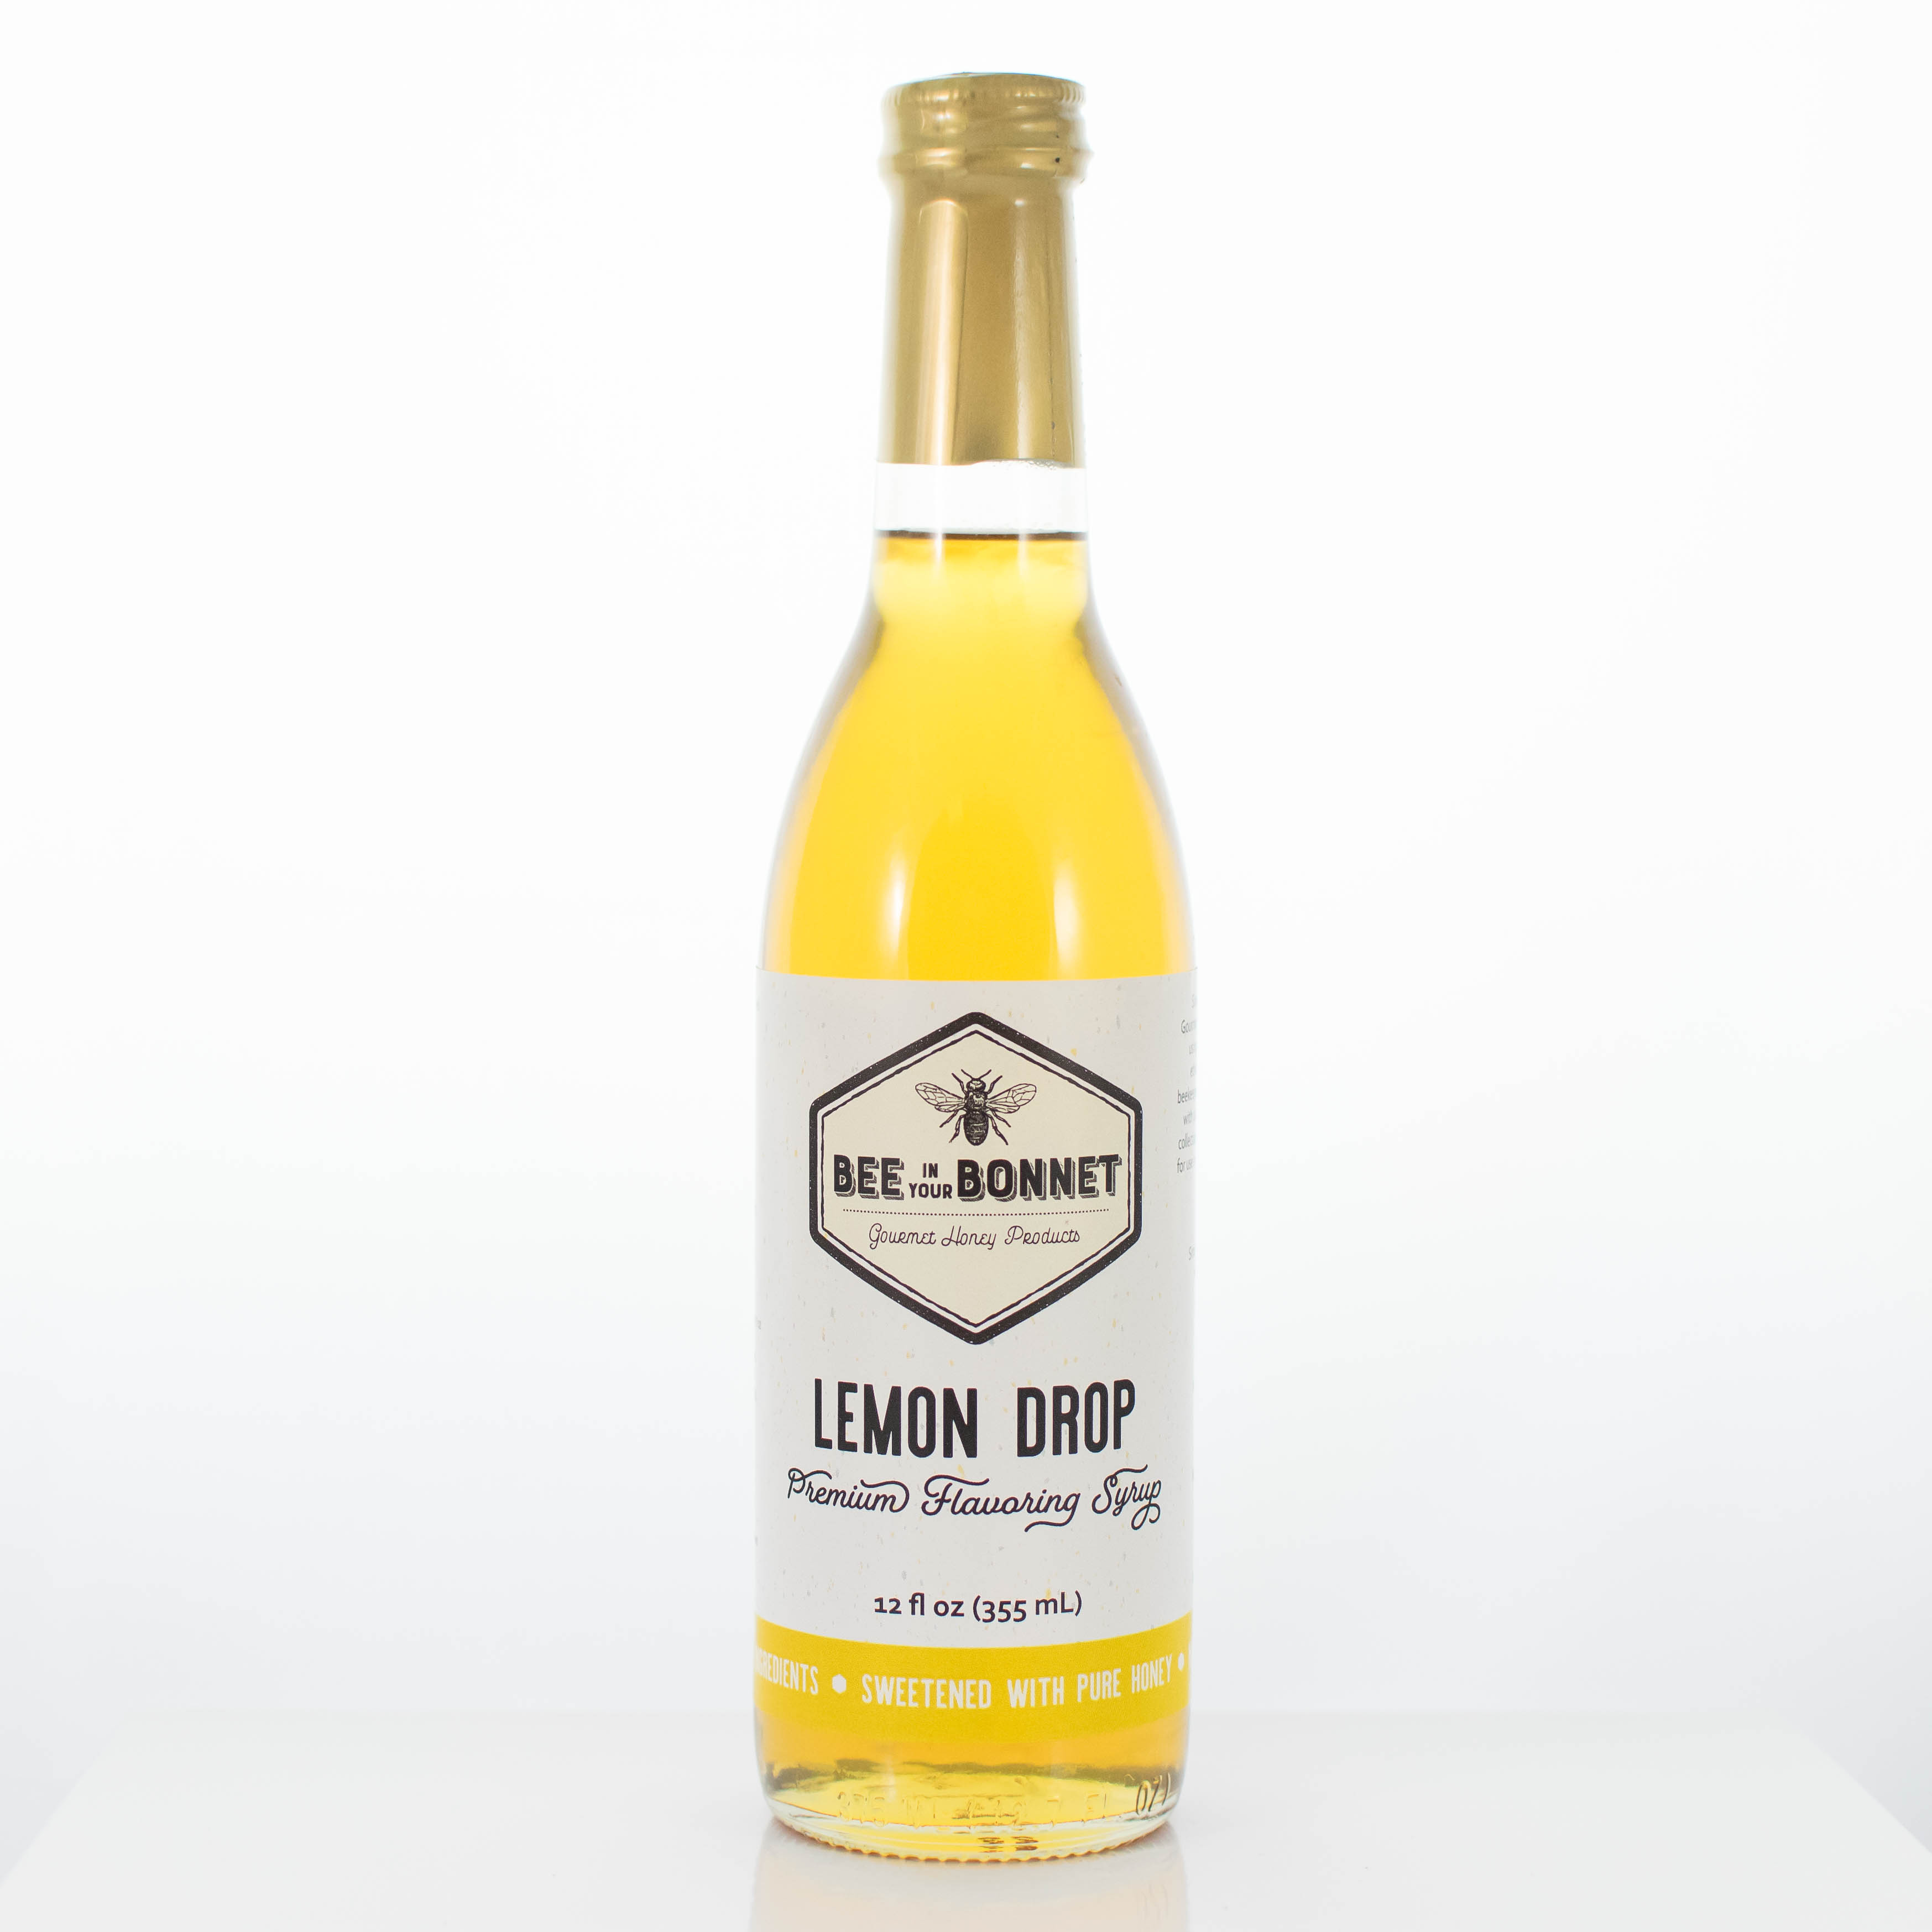 Lemon Drop Premium Flavoring Syrup